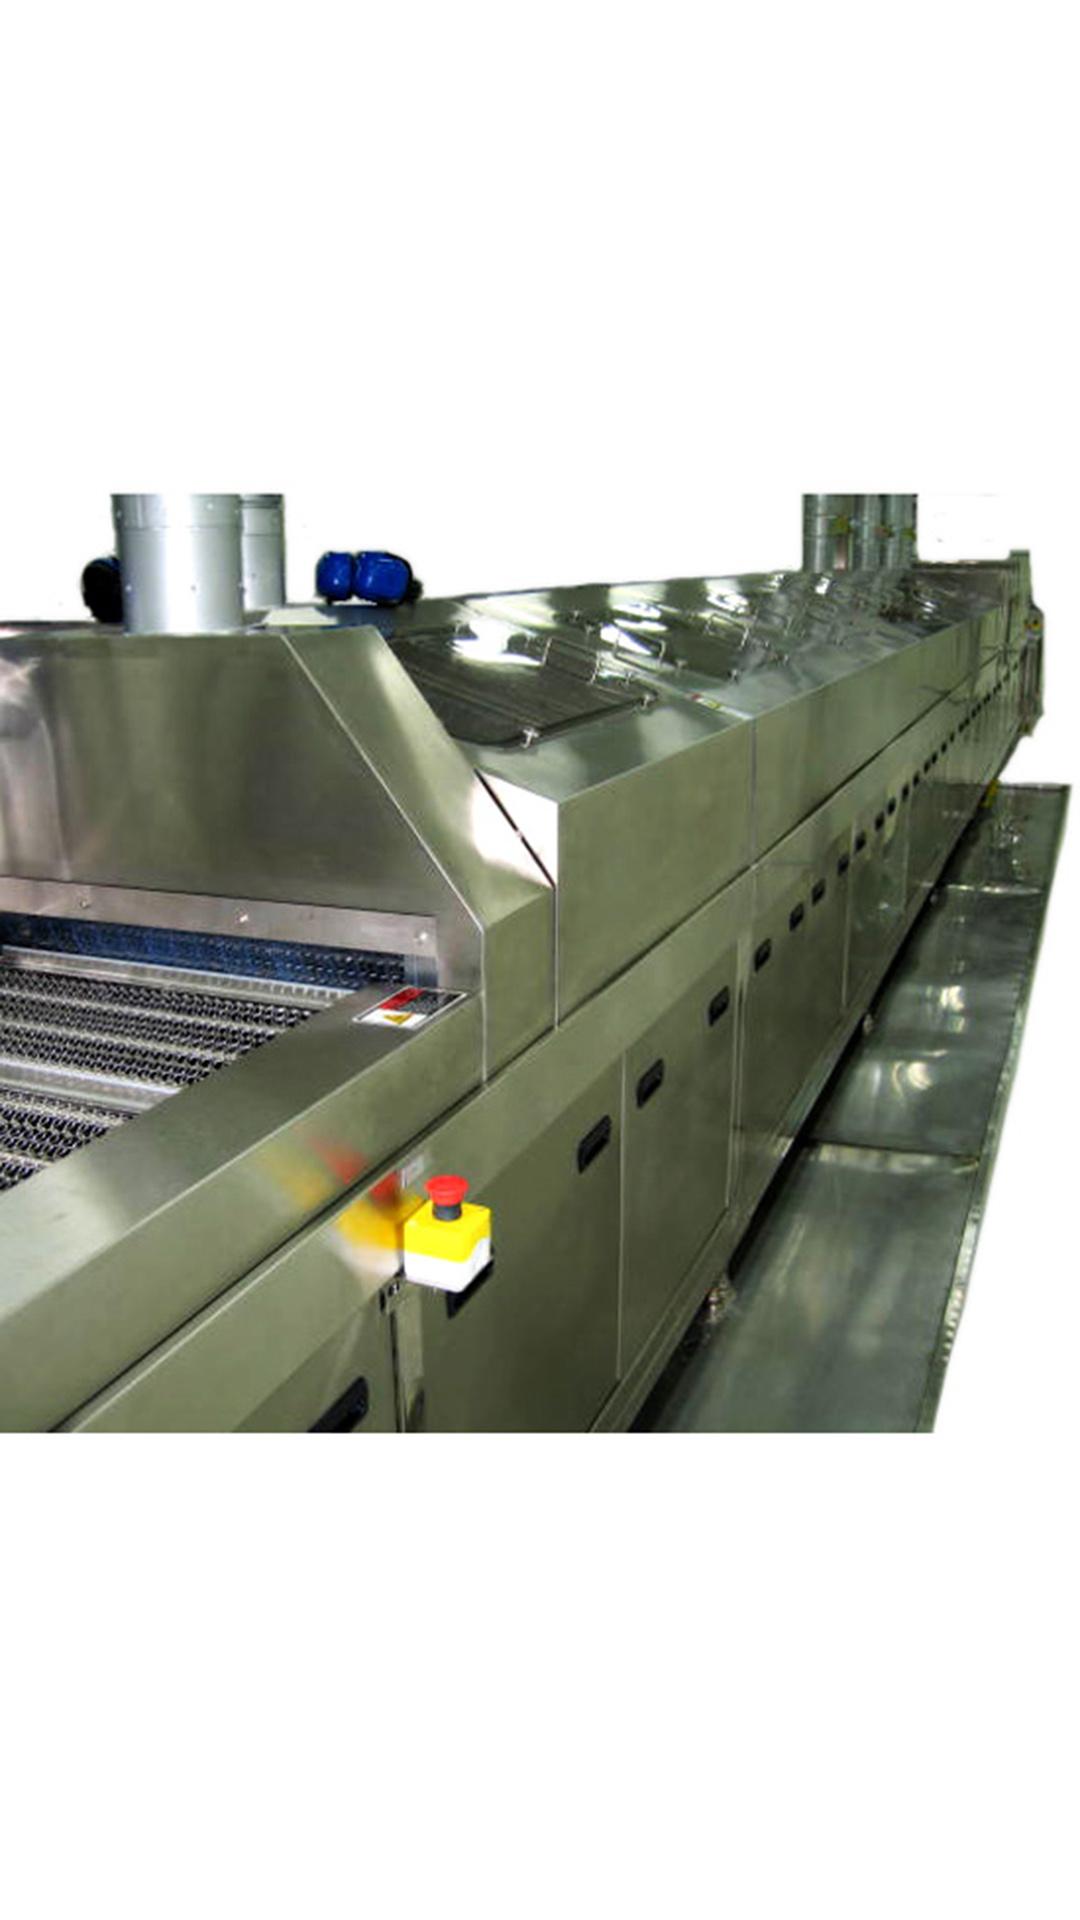 ulbrich-maschinenbau-cyclojet-conveyor-tunnel-cleaner